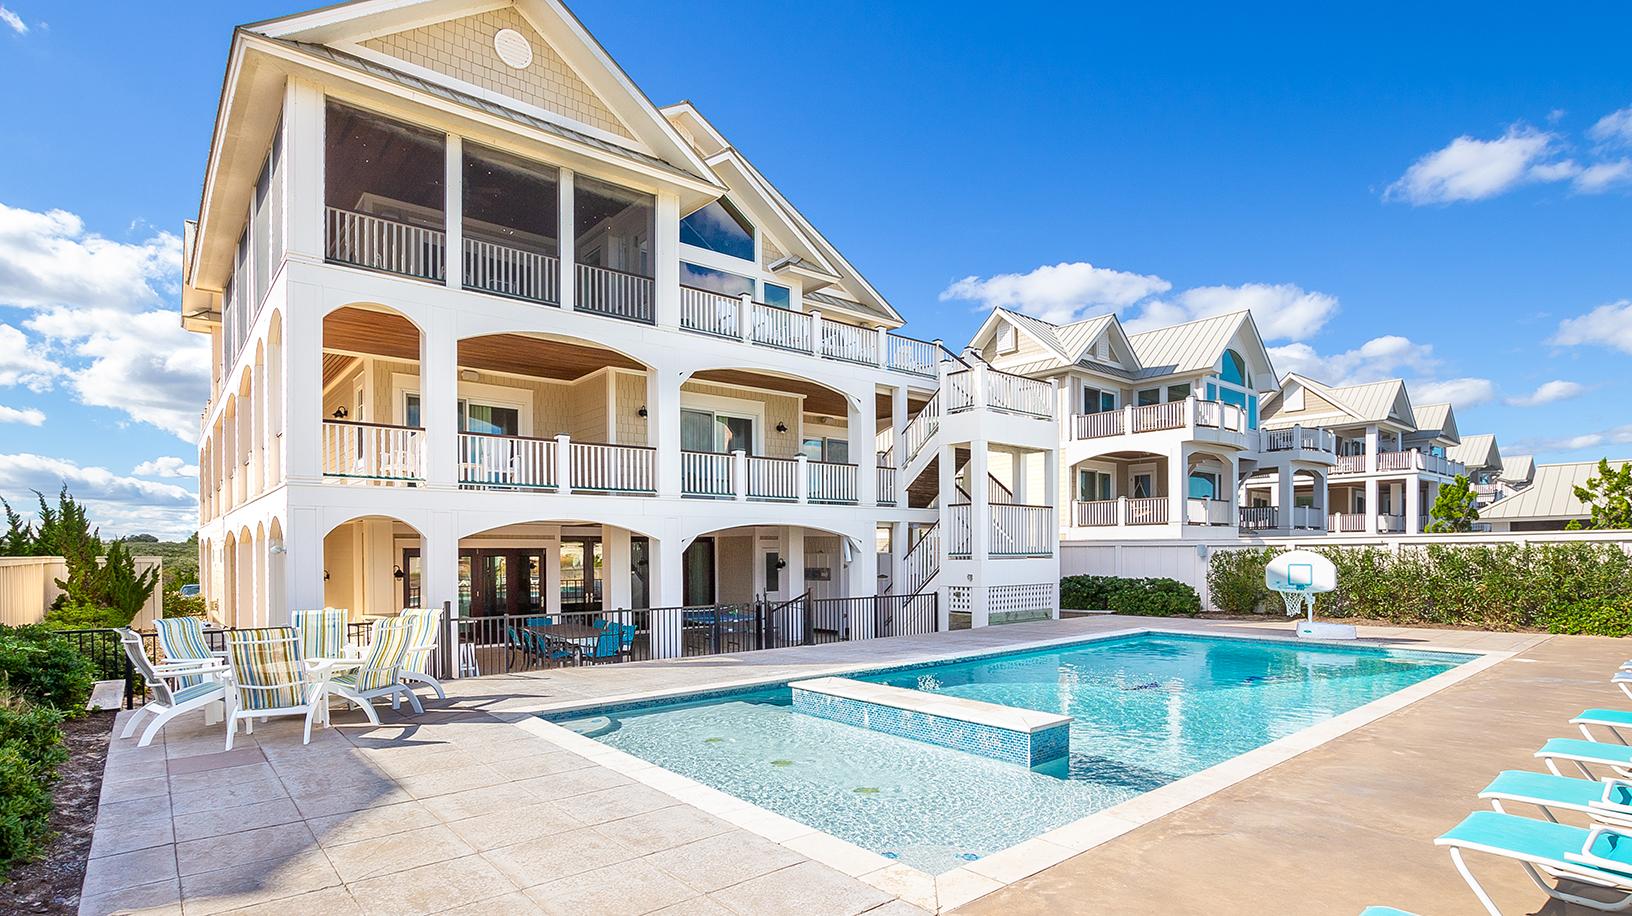 The Beach House Pine Island Corolla Nc